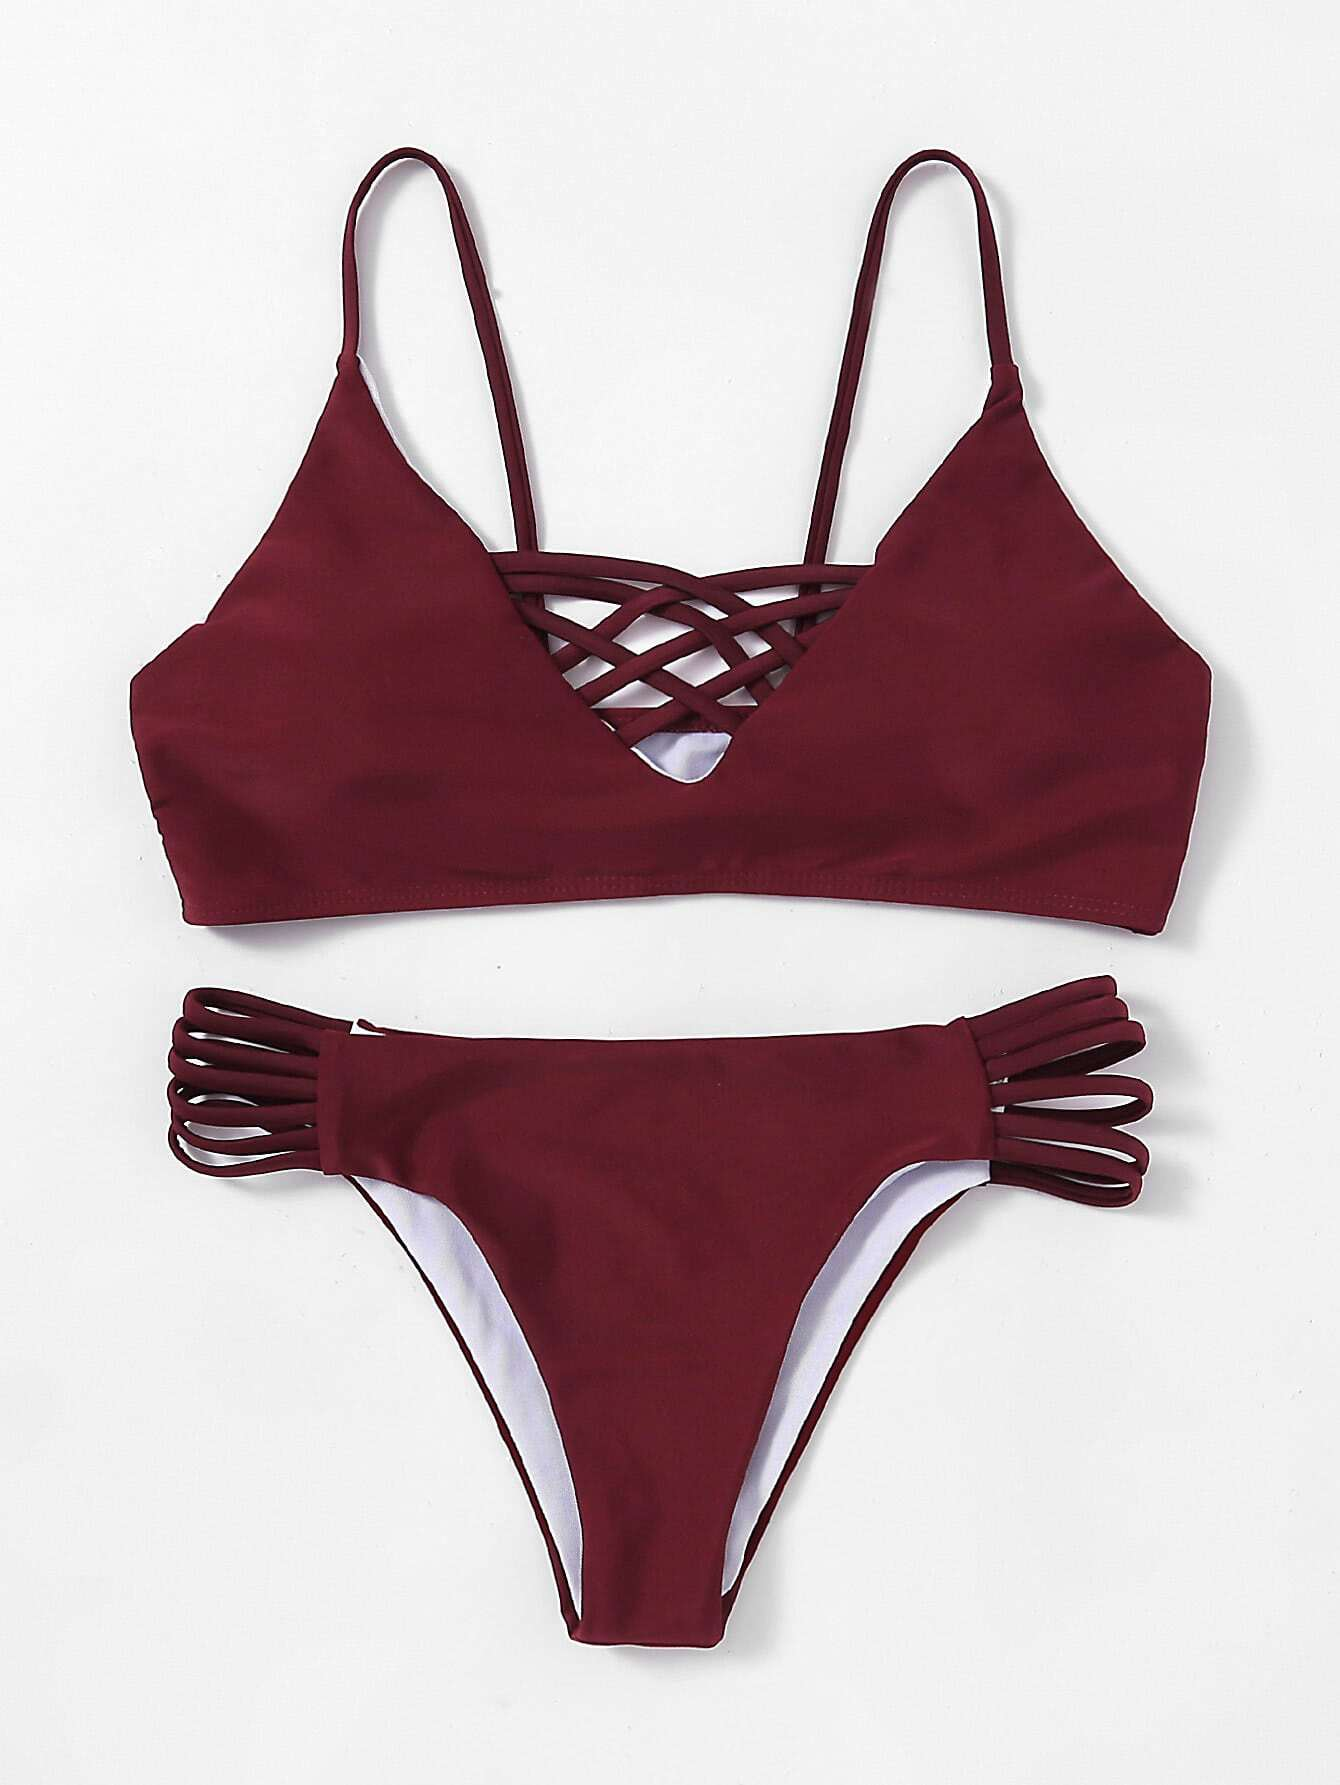 Criss Cross Ladder Cutout Bikini Set swimwear170816307